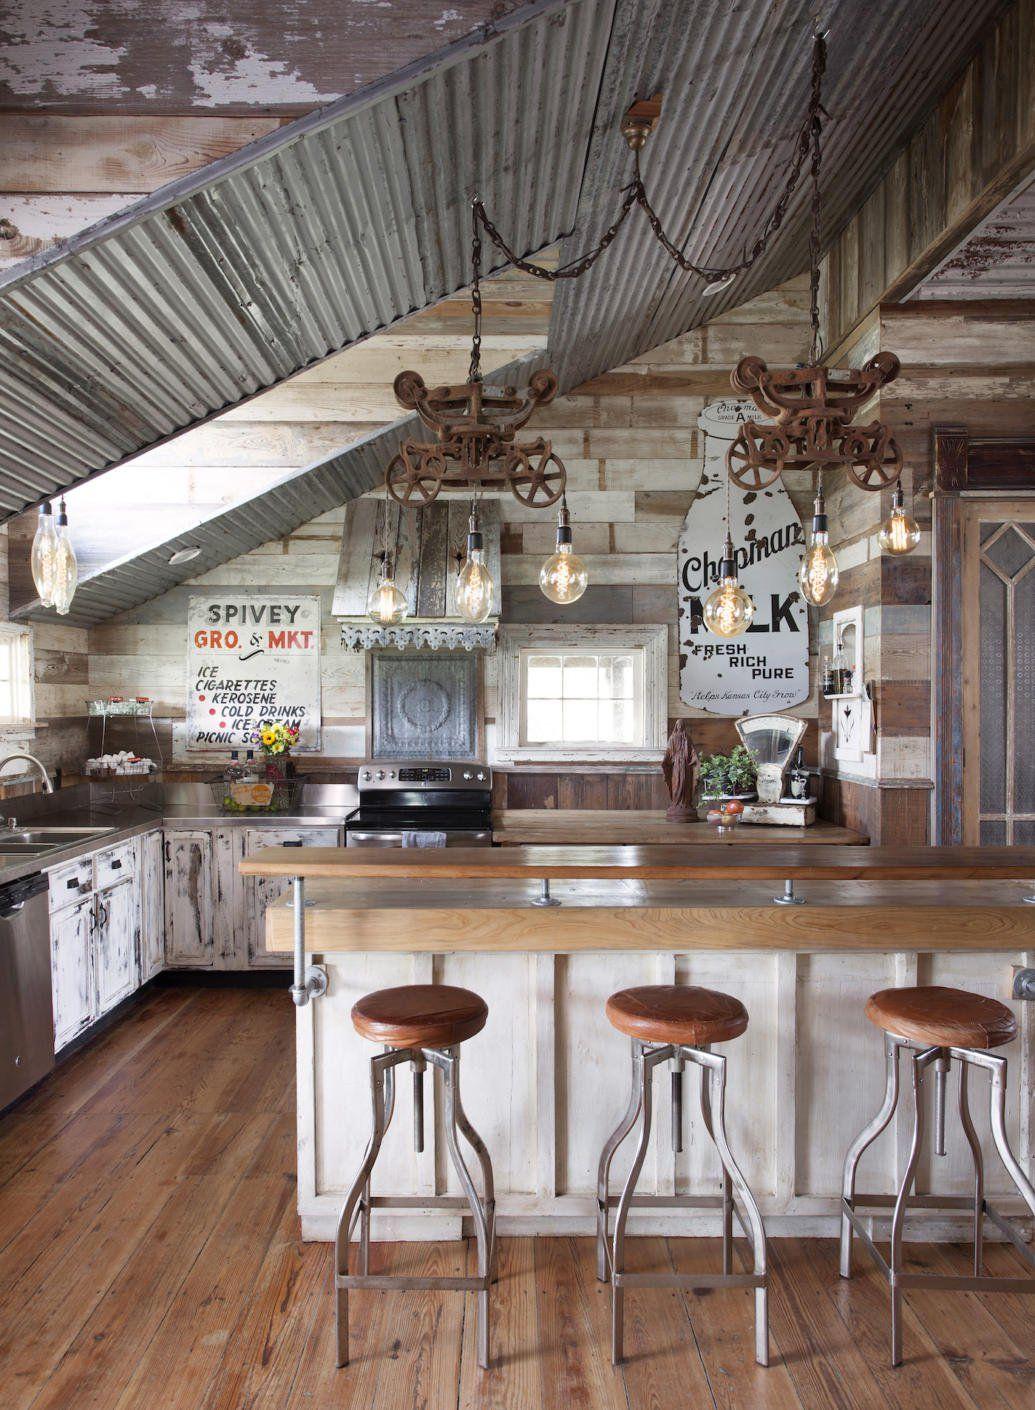 Rustikale vintage badezimmer dekor look inside an antique dealerus dream home in round top  apartments